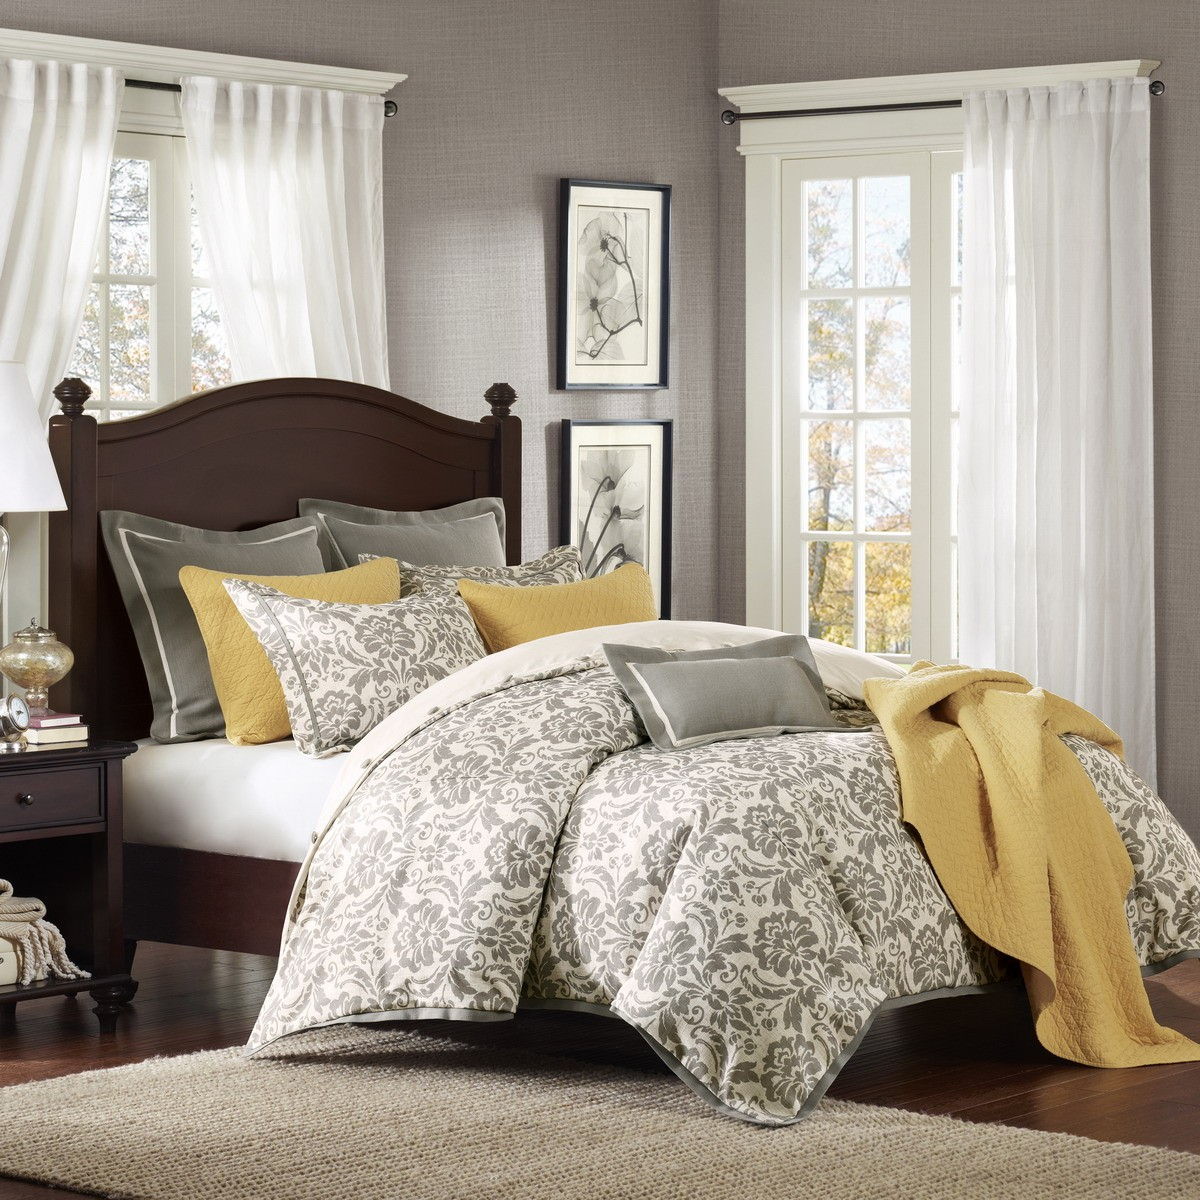 Grey King Size Bedding Ideas - HomesFeed